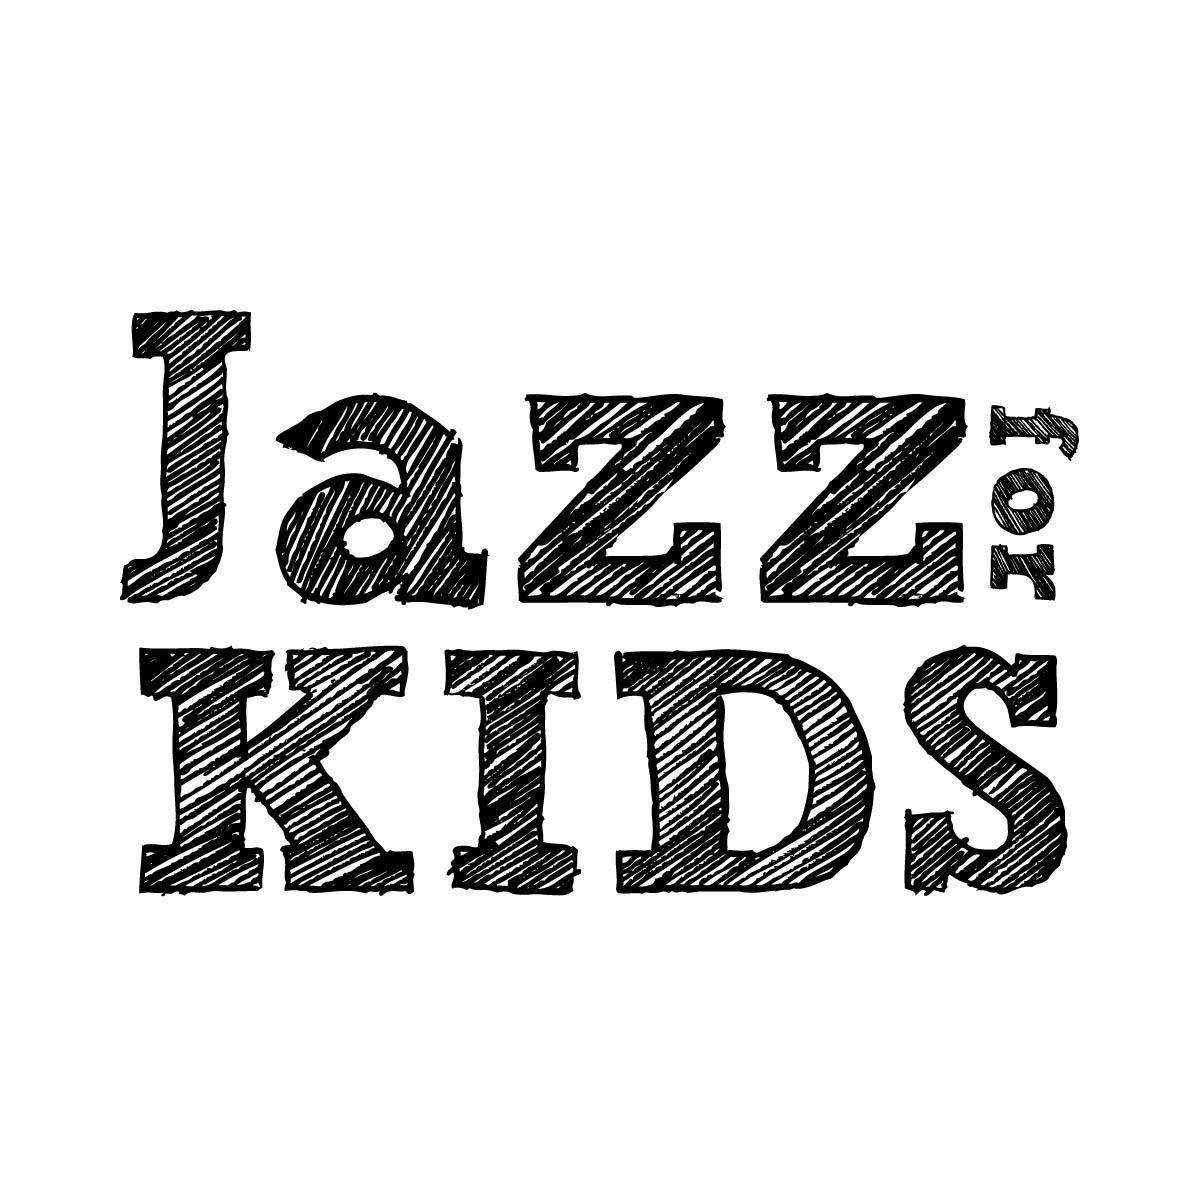 Jazz4kids Singap Wiggleake Garden City Jazz 762 233